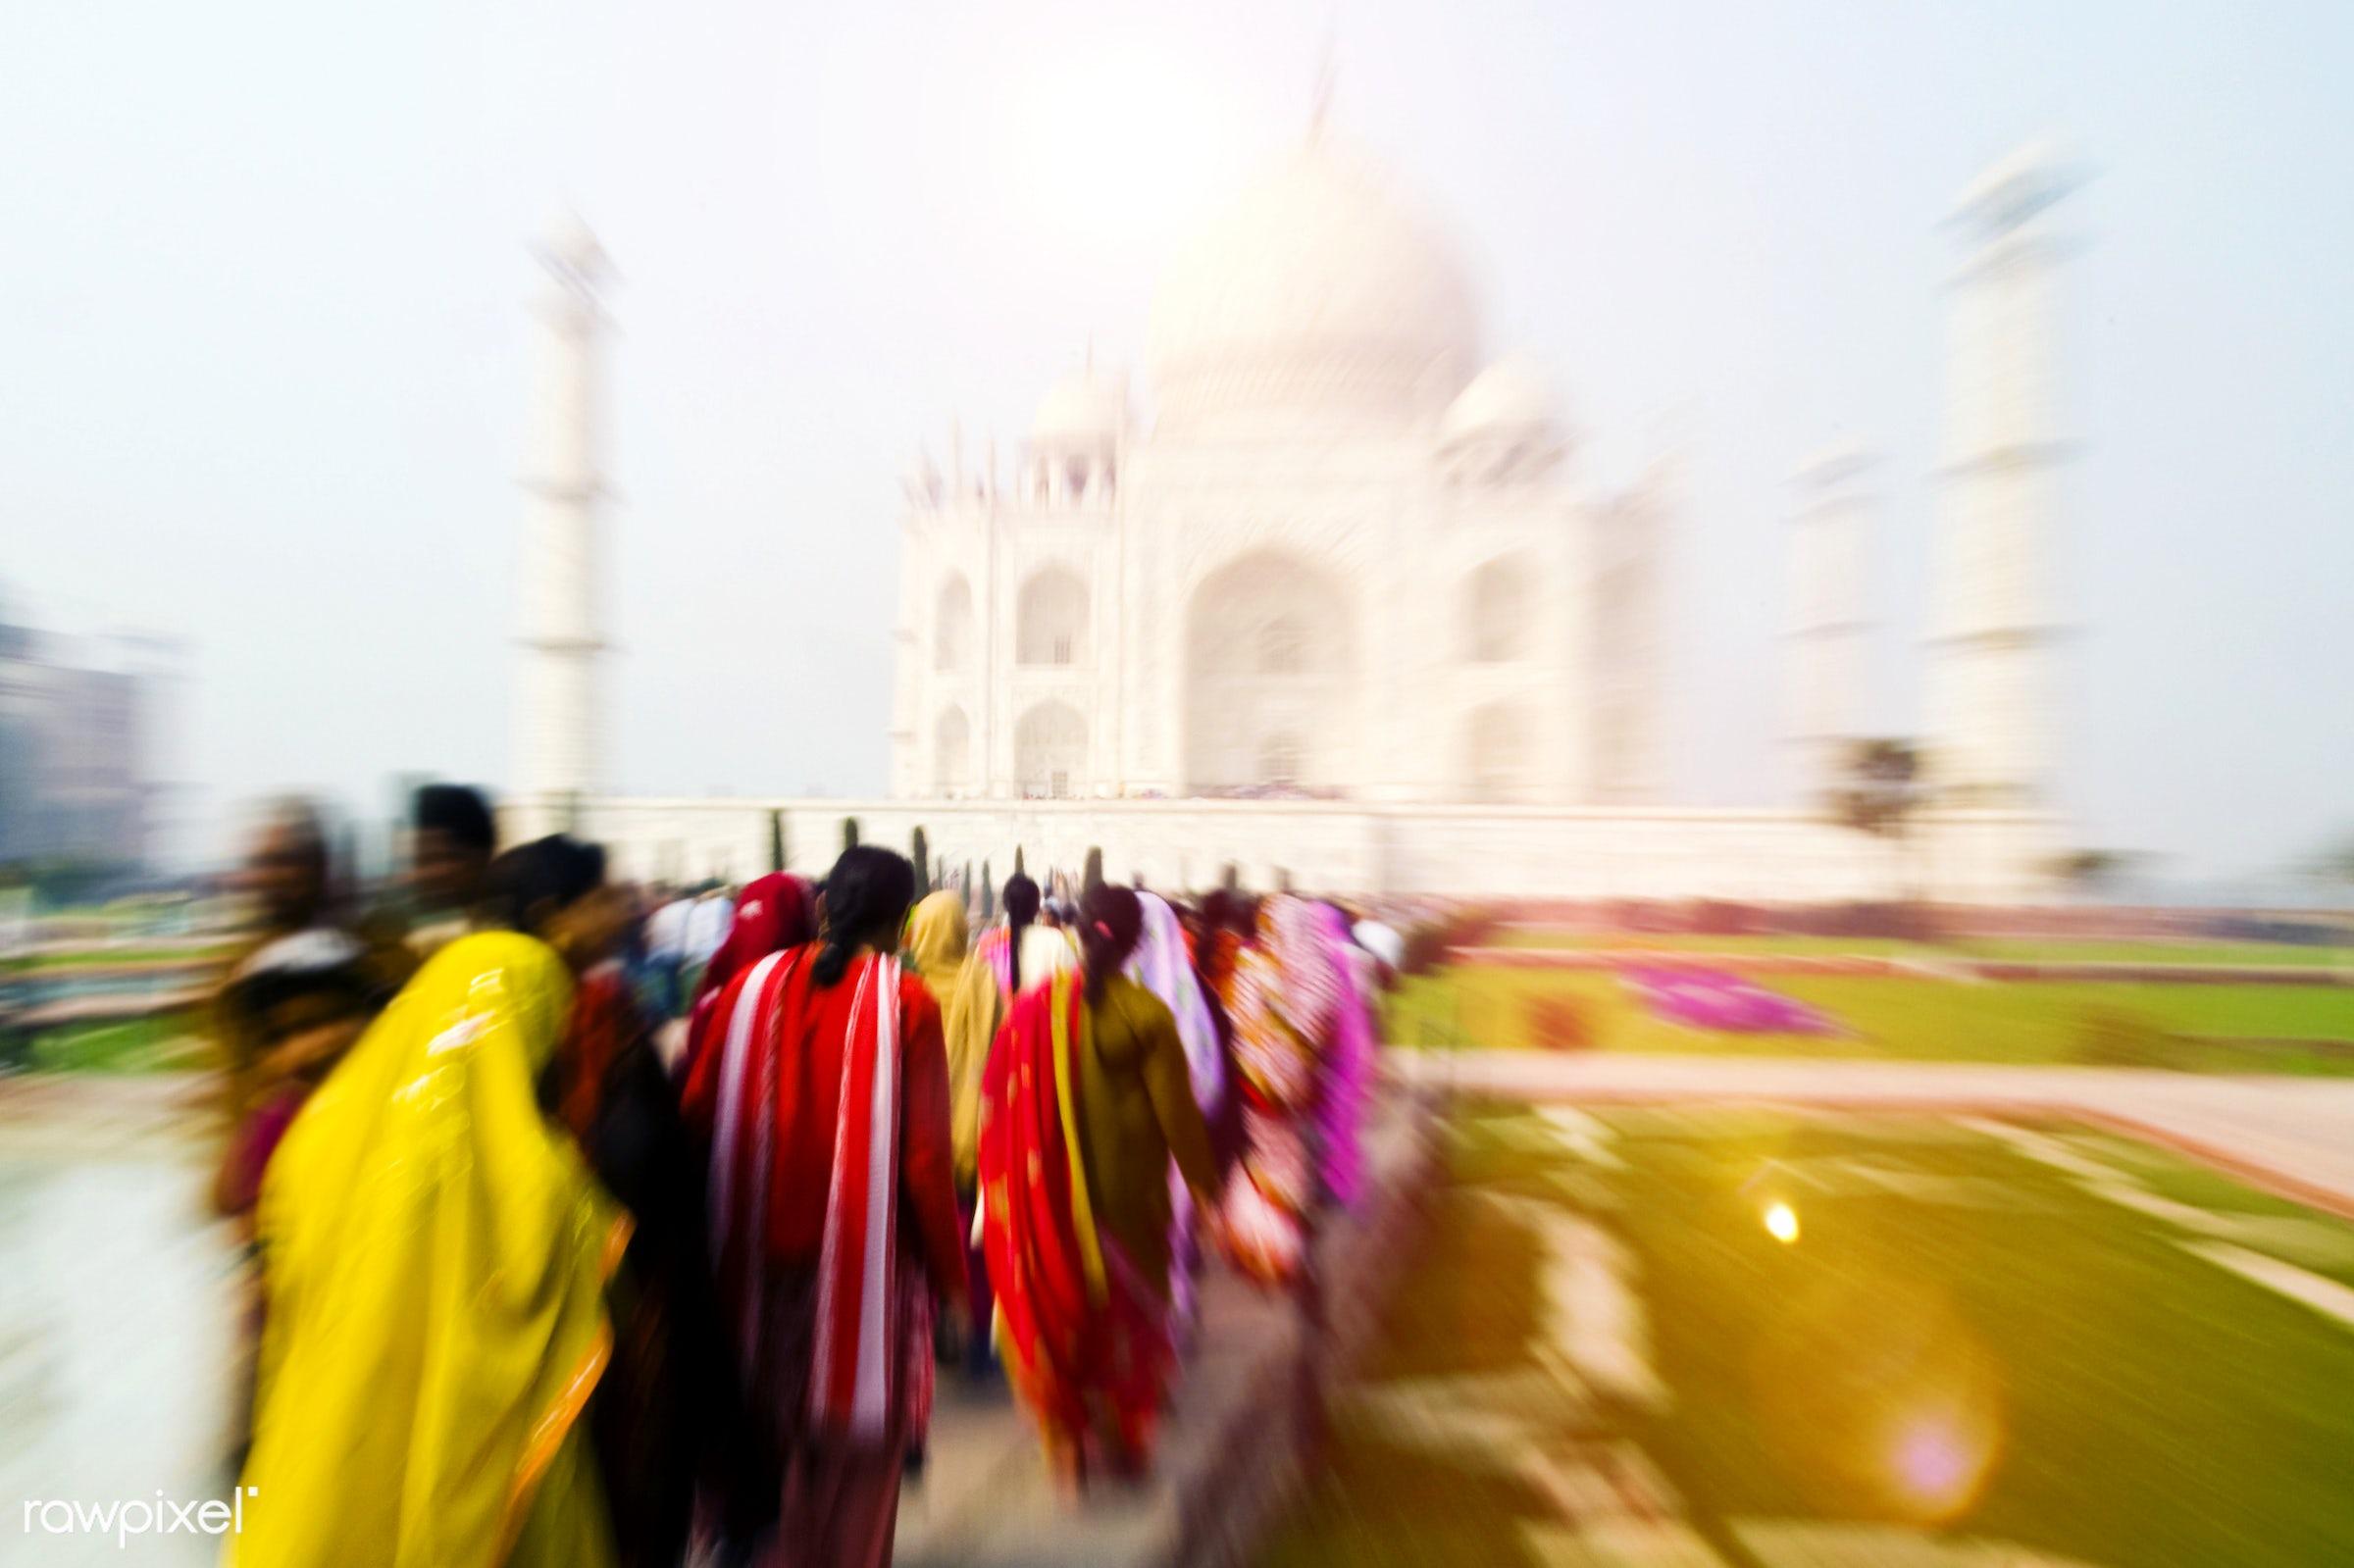 People walking through the Taj Mahal. - 7 wonders, architectural styles, architecture, architecture and buildings, asia,...